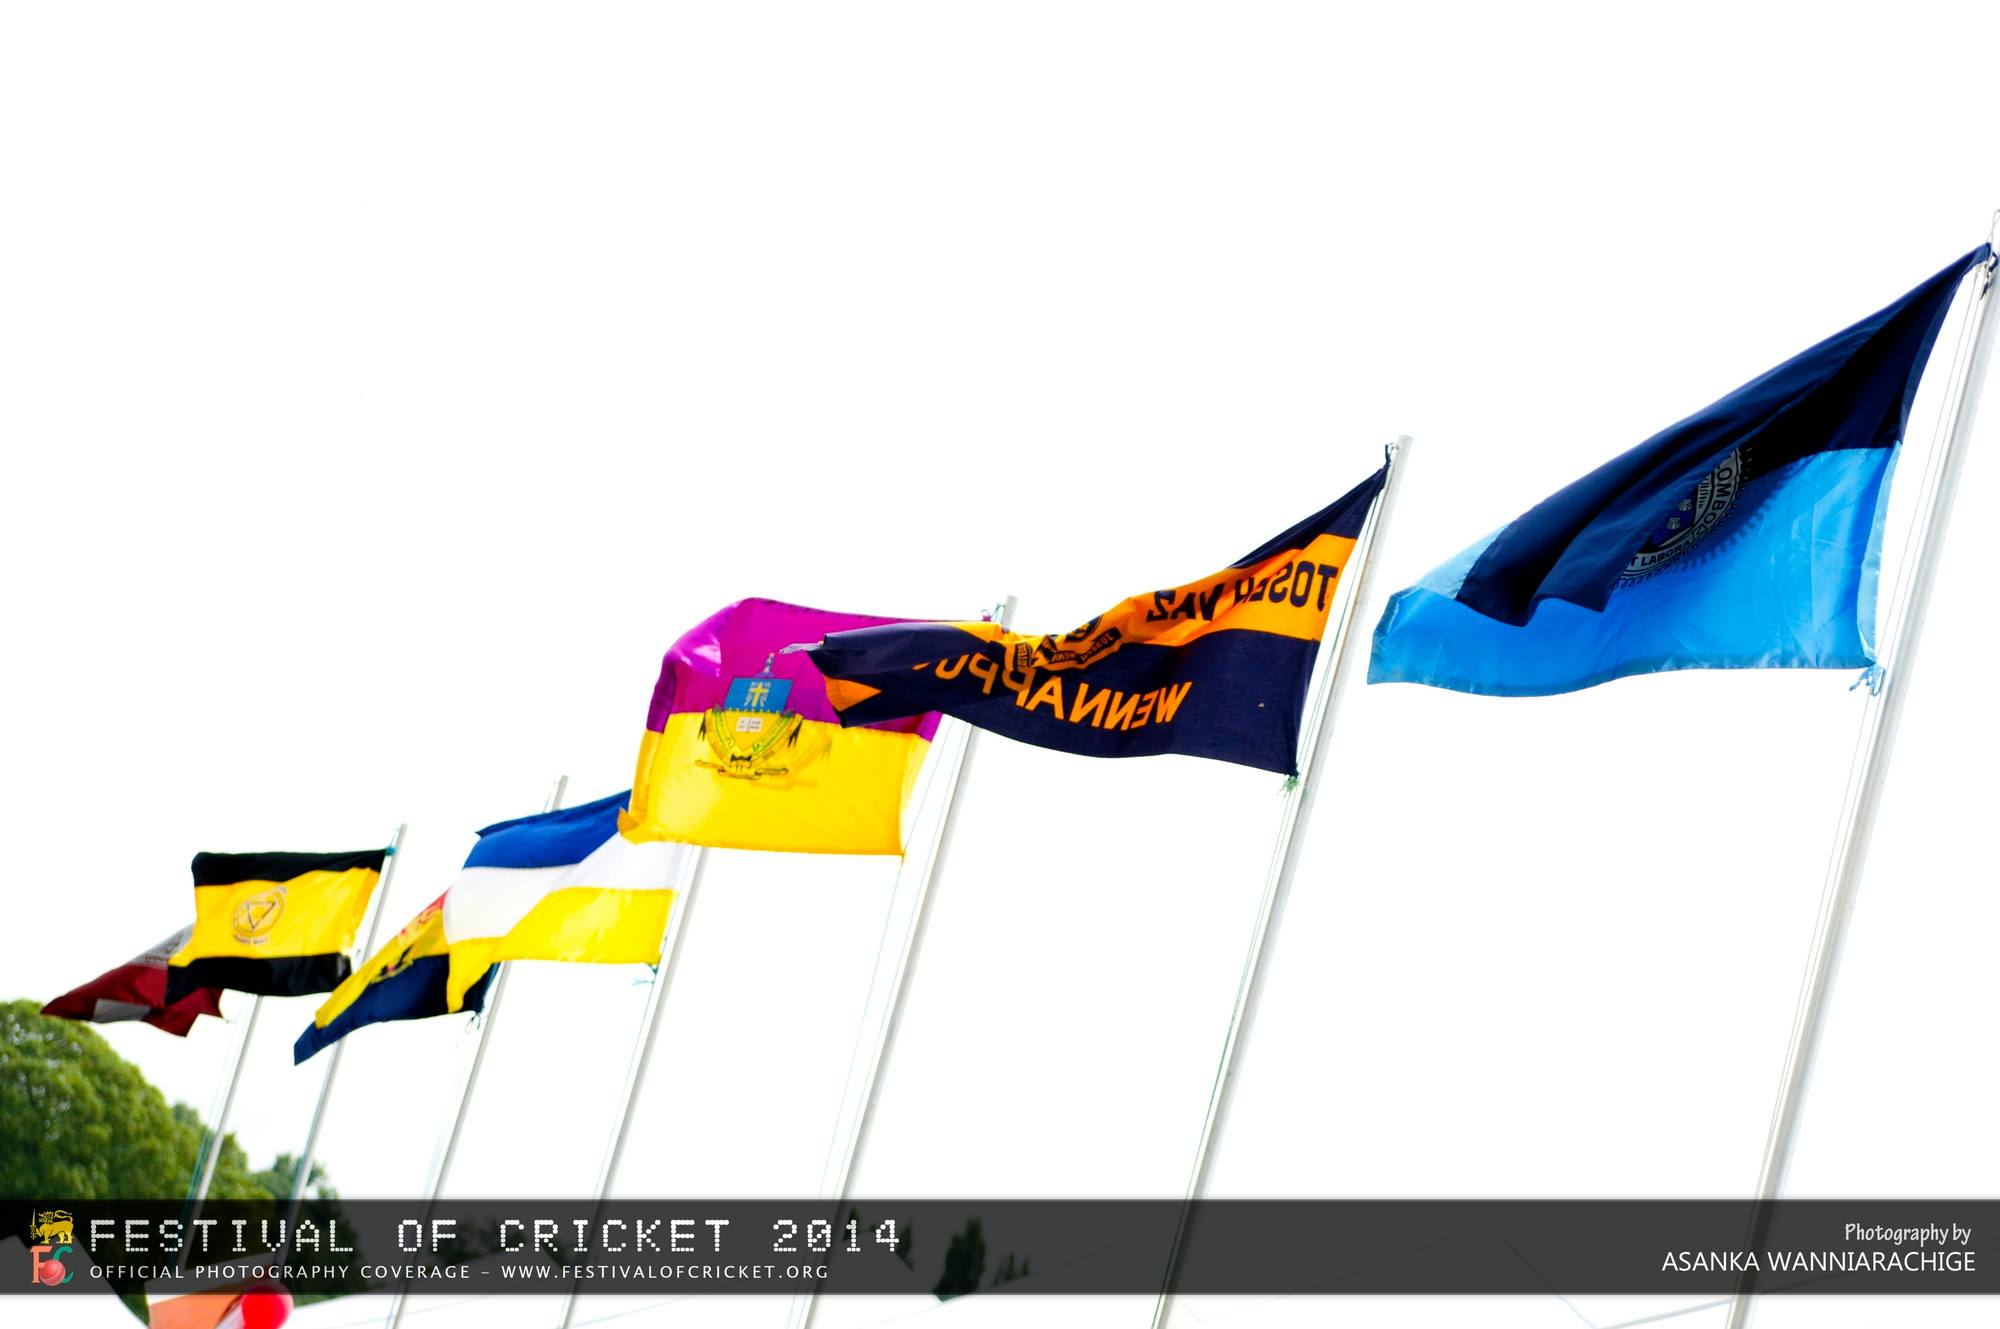 Festival of Cricket 2012